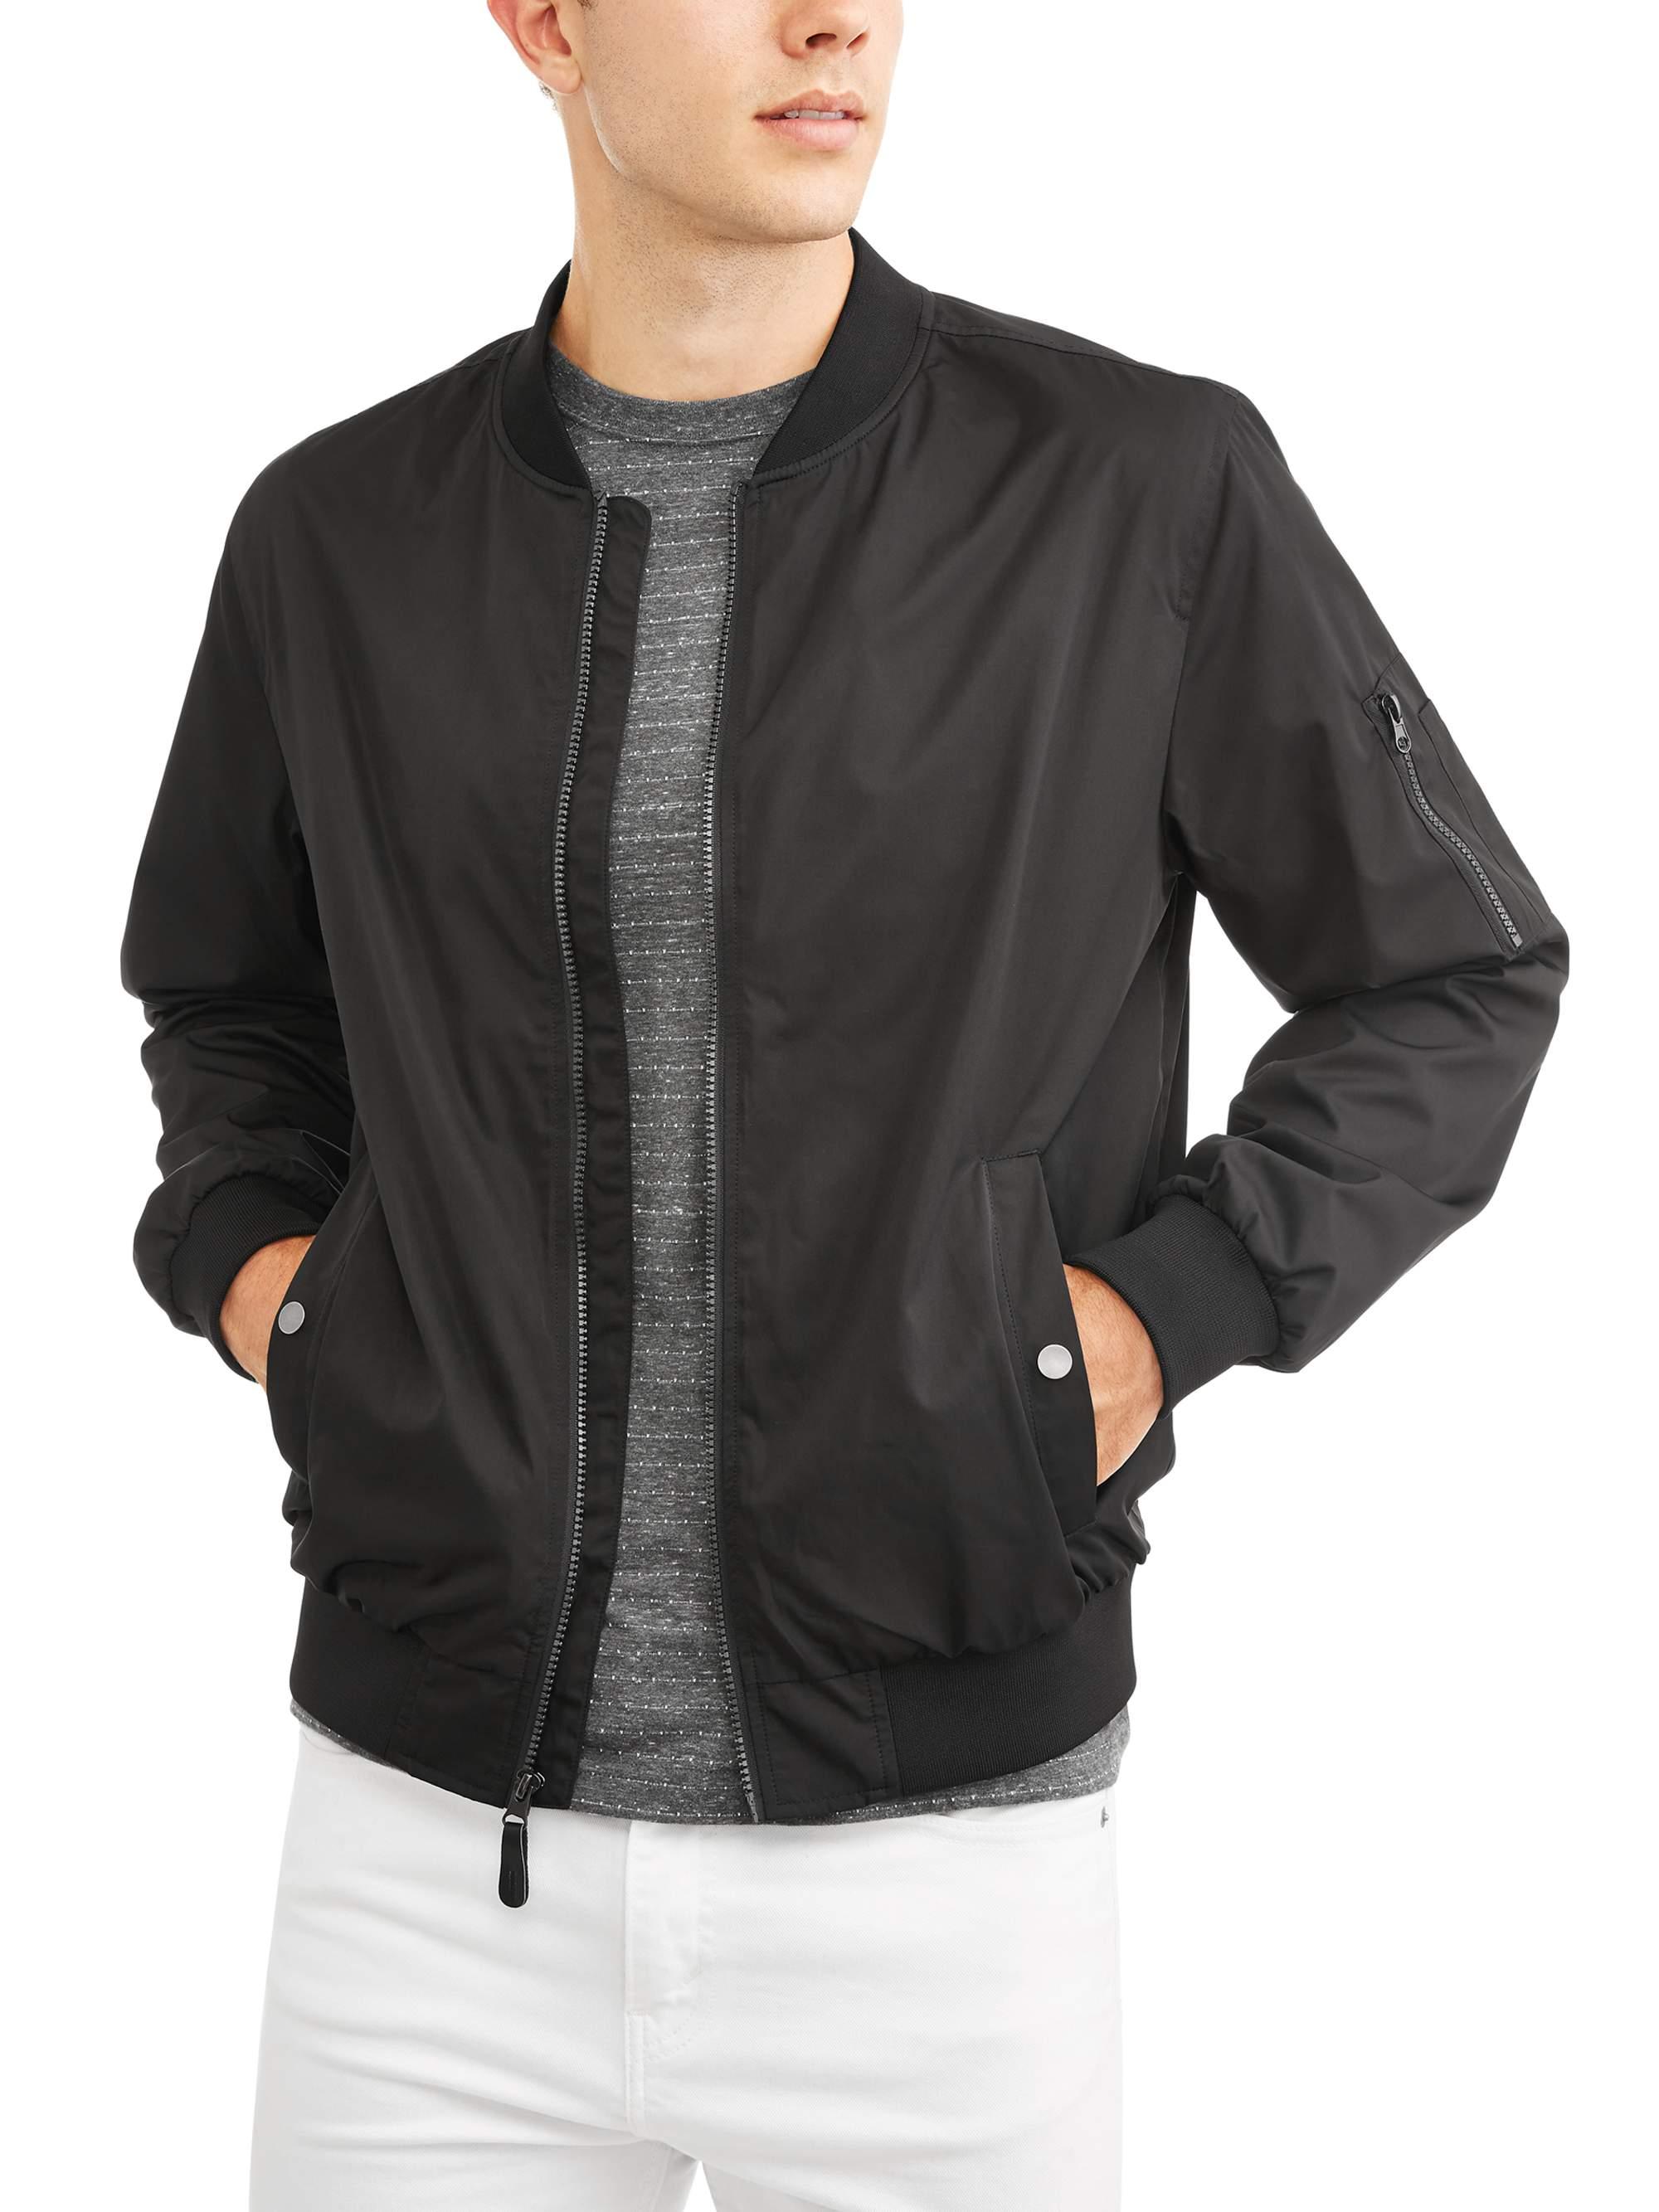 Men's Bomber Jacket, Up to Size 5XL